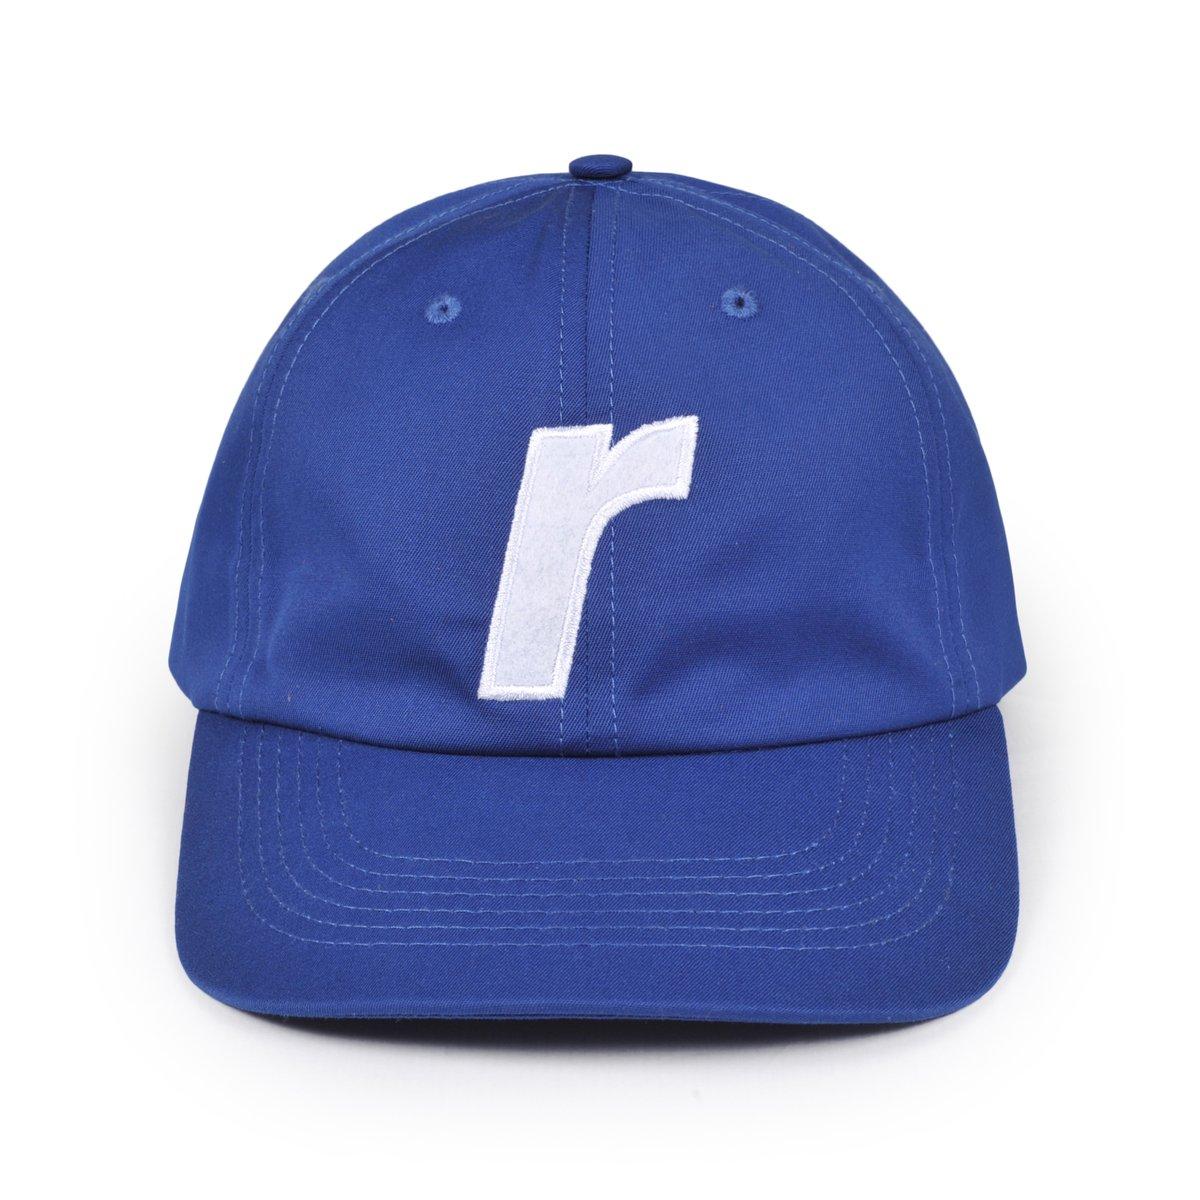 【RAVE SKATEBOARDS/レイブスケートボード】R LOGO CAP ダドキャップ / NAVY